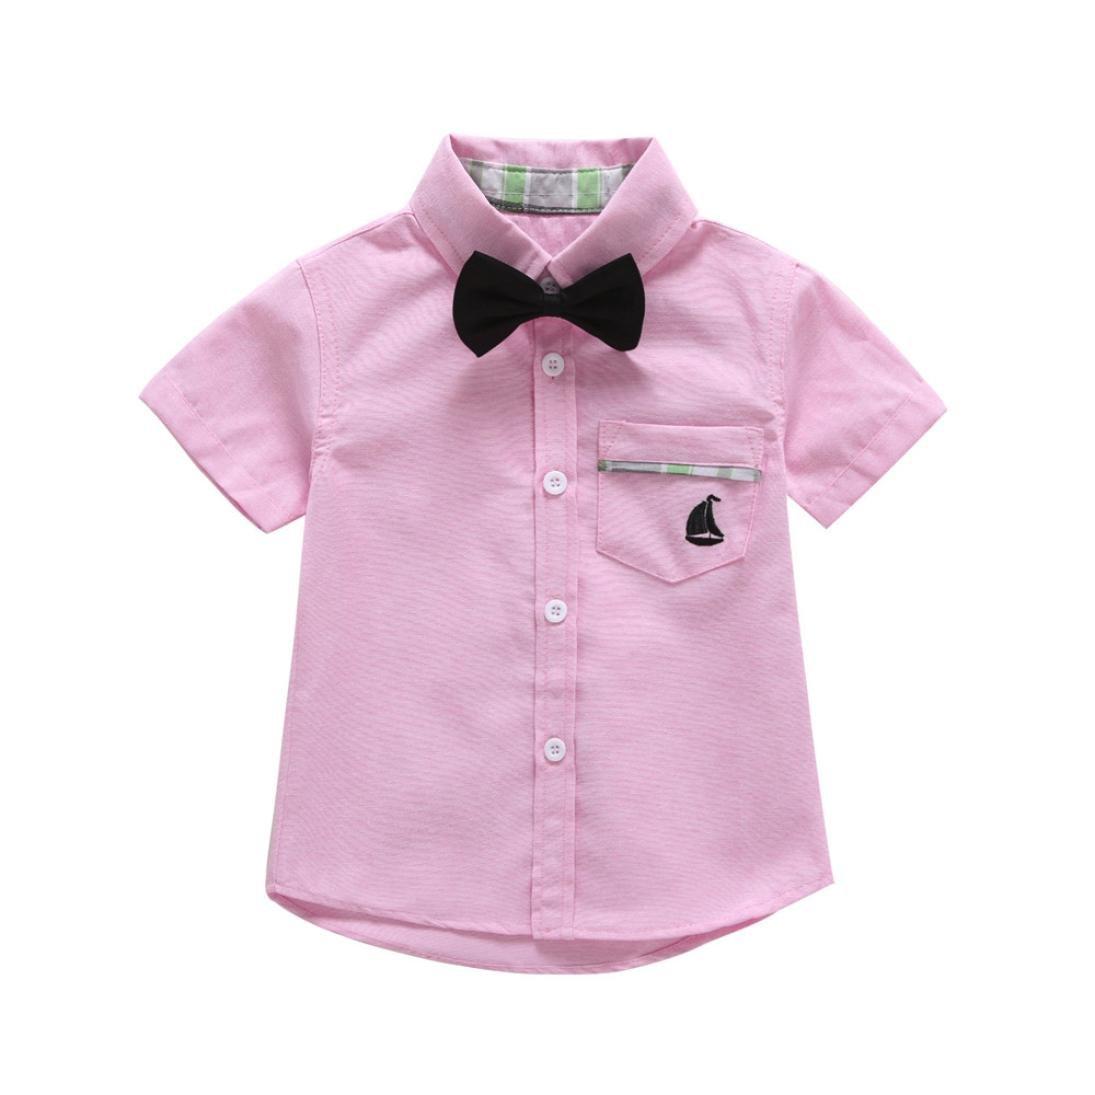 Dinlong Toddler Infant Kid Baby Boys Clothes Solid Tops T Shirt Gentlemen Blouse Din_95